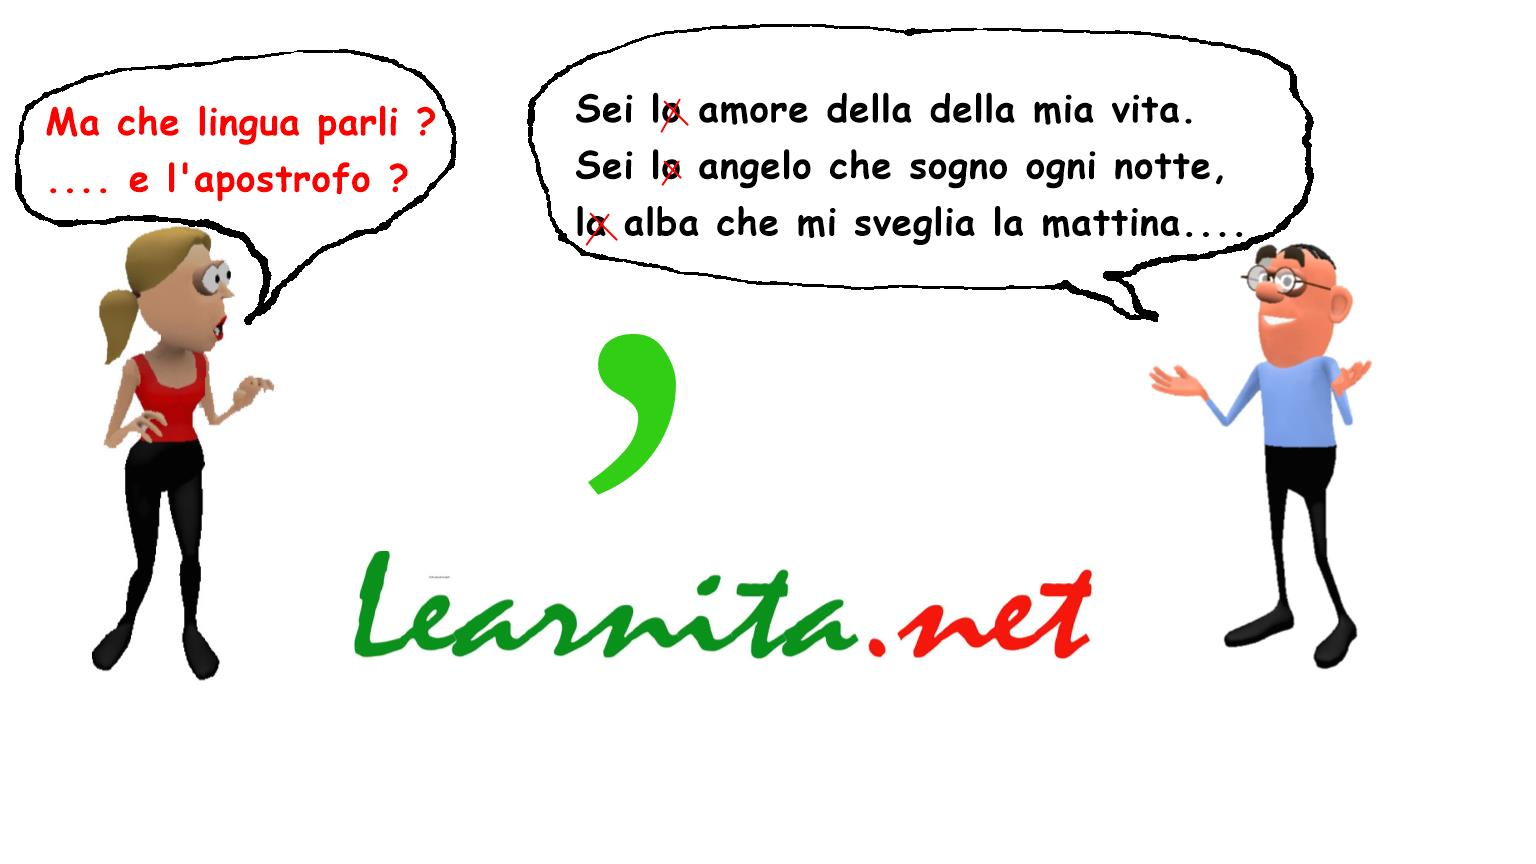 use of apostrophe in italian language